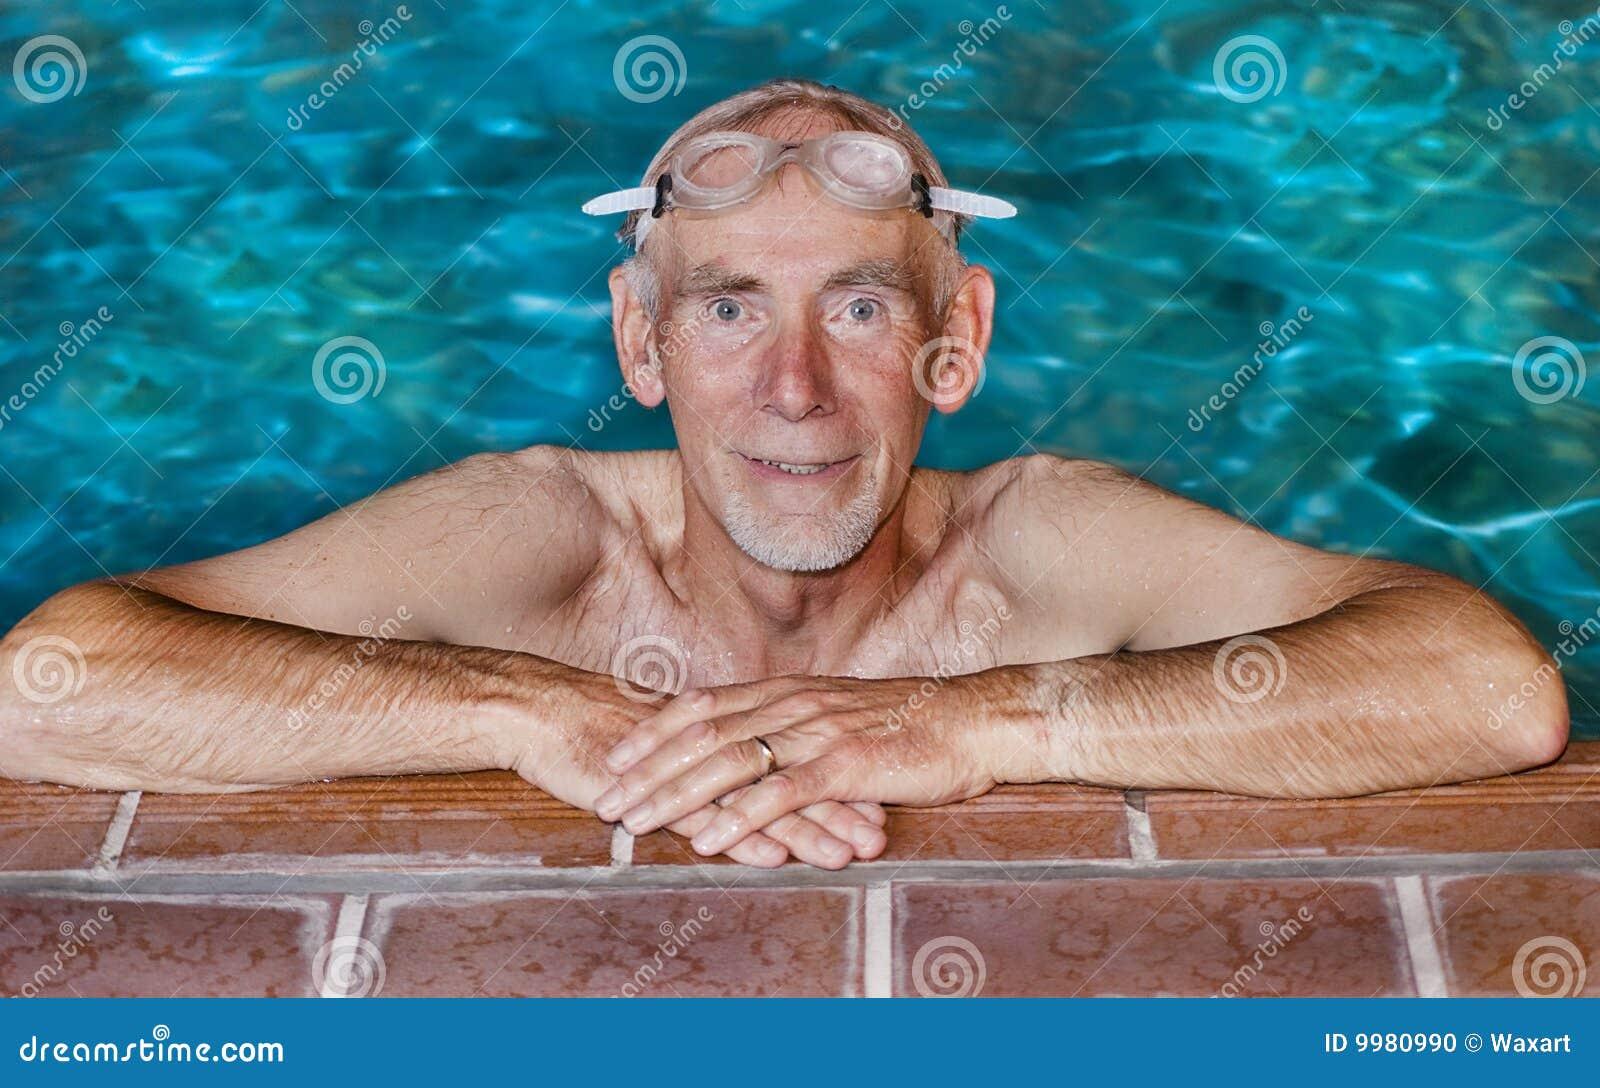 Senior man in swimming pool stock photo image 9980990 for Pool man show